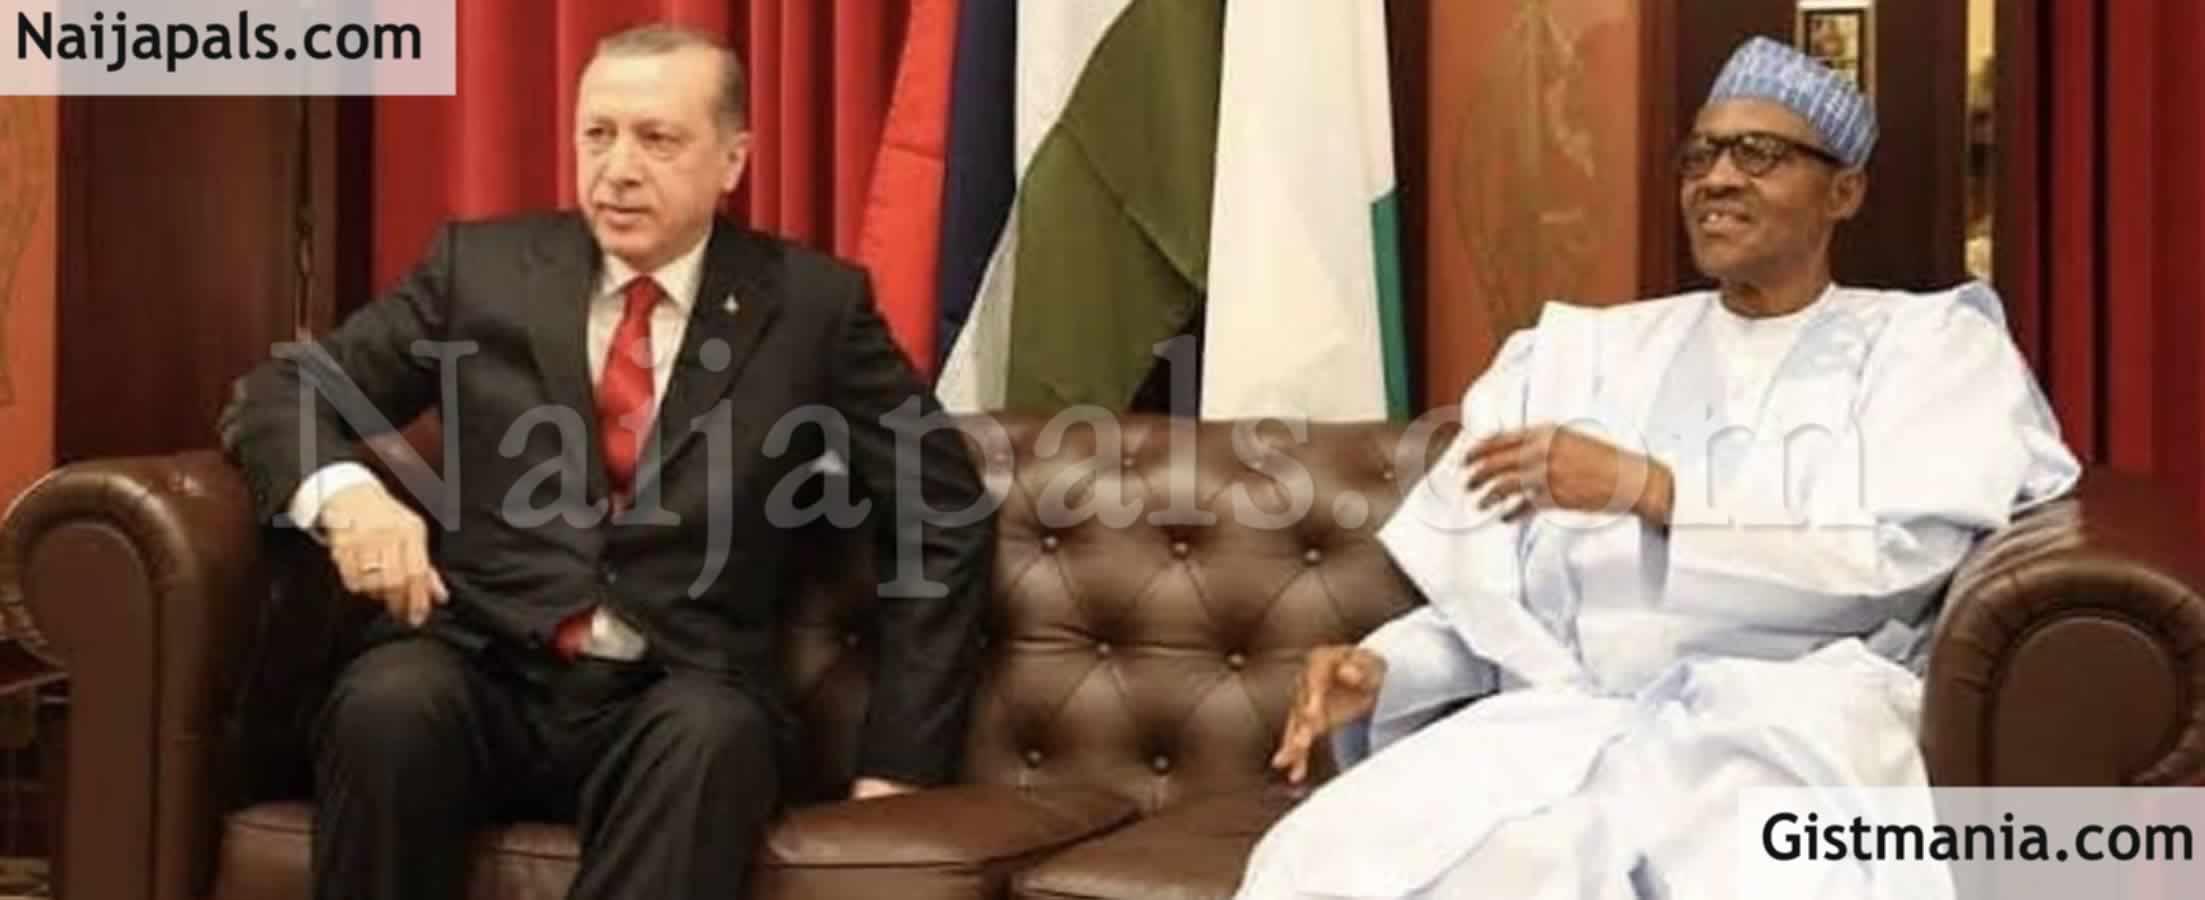 <img alt='.' class='lazyload' data-src='https://img.gistmania.com/emot/shocked.gif' /> <b>Turkish President Phones Buhari, Seeks Nigeria's Support For Palestine Following Israel Attacks</b>